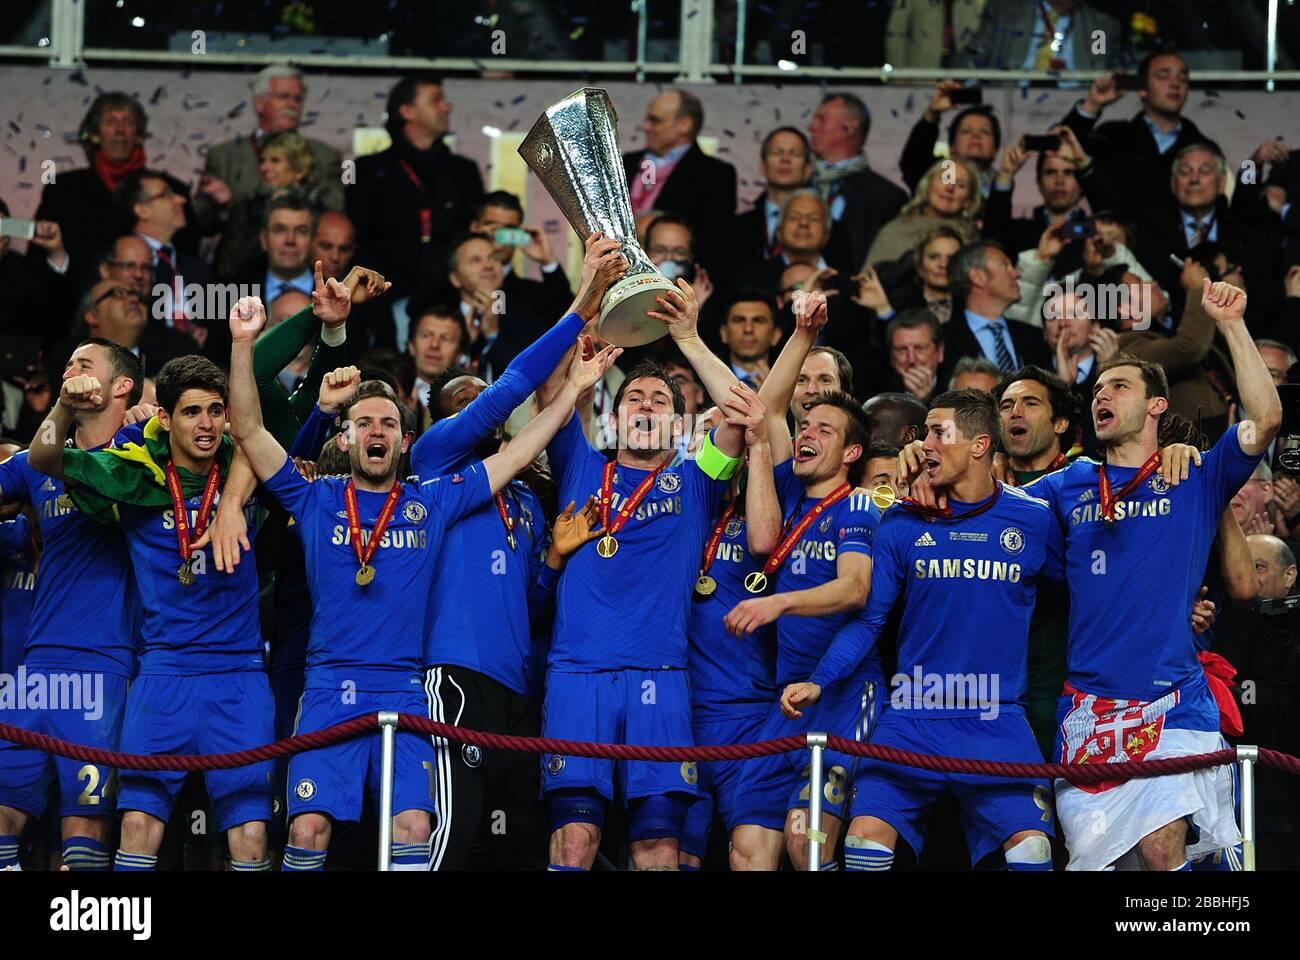 chelsea s frank lampard lifts the uefa europa league trophy stock photo alamy https www alamy com chelseas frank lampard lifts the uefa europa league trophy image351354029 html